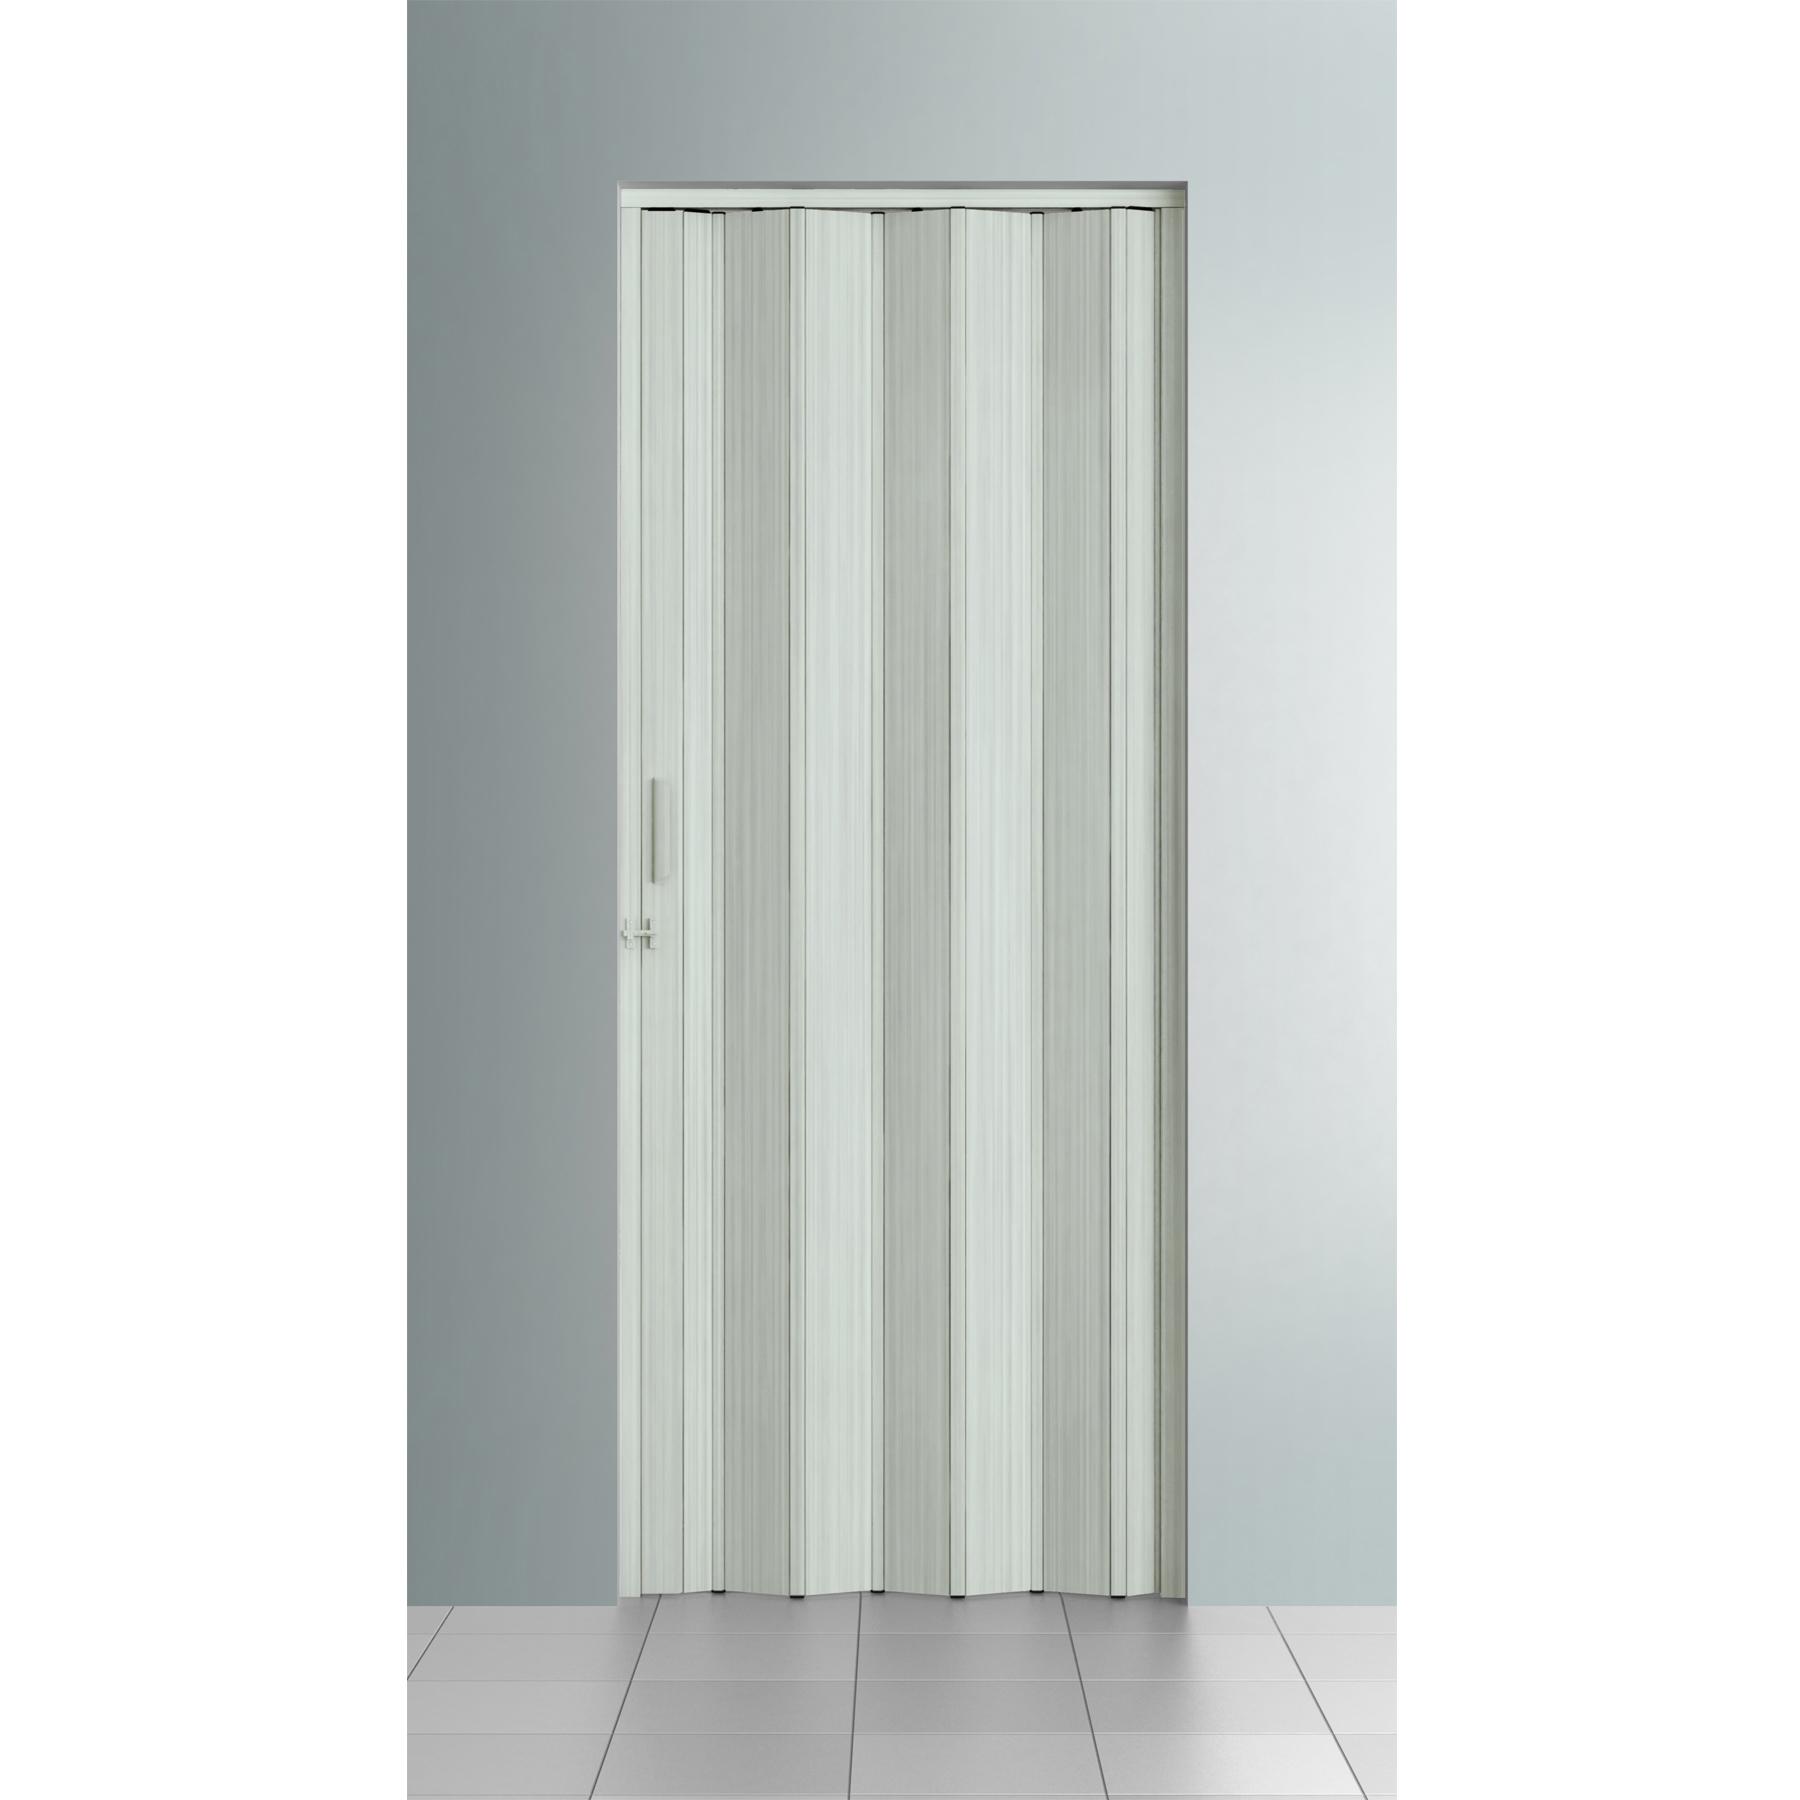 Porta sanfonada lisa pl stico pvc ambos os lados 2 1x0 6m - Porta pvc leroy merlin ...